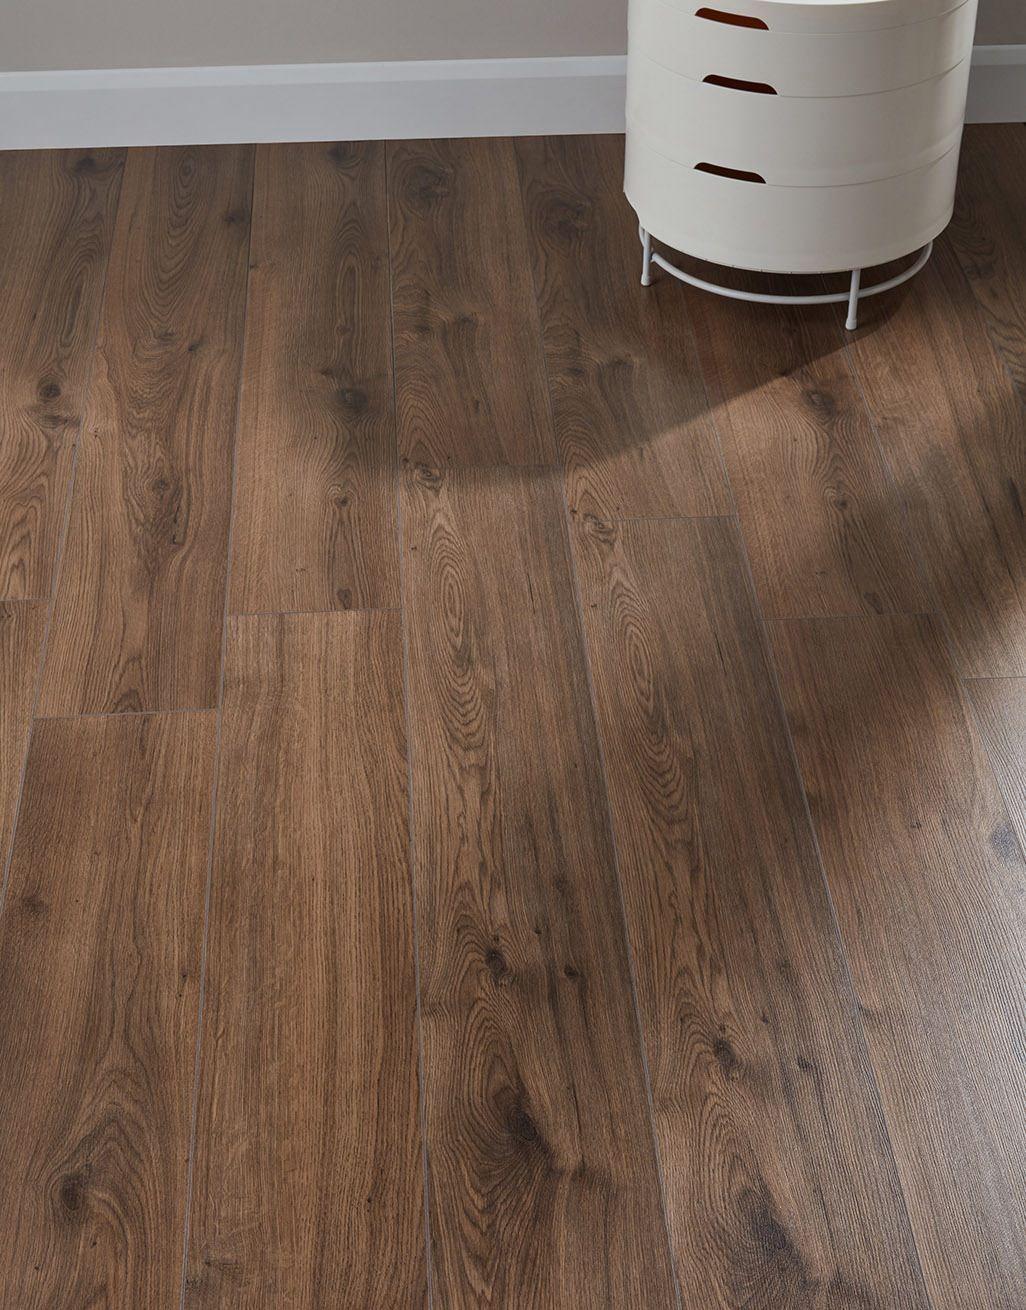 Farmhouse Dark Oak Laminate Flooring, Laminate Flooring Dark Brown